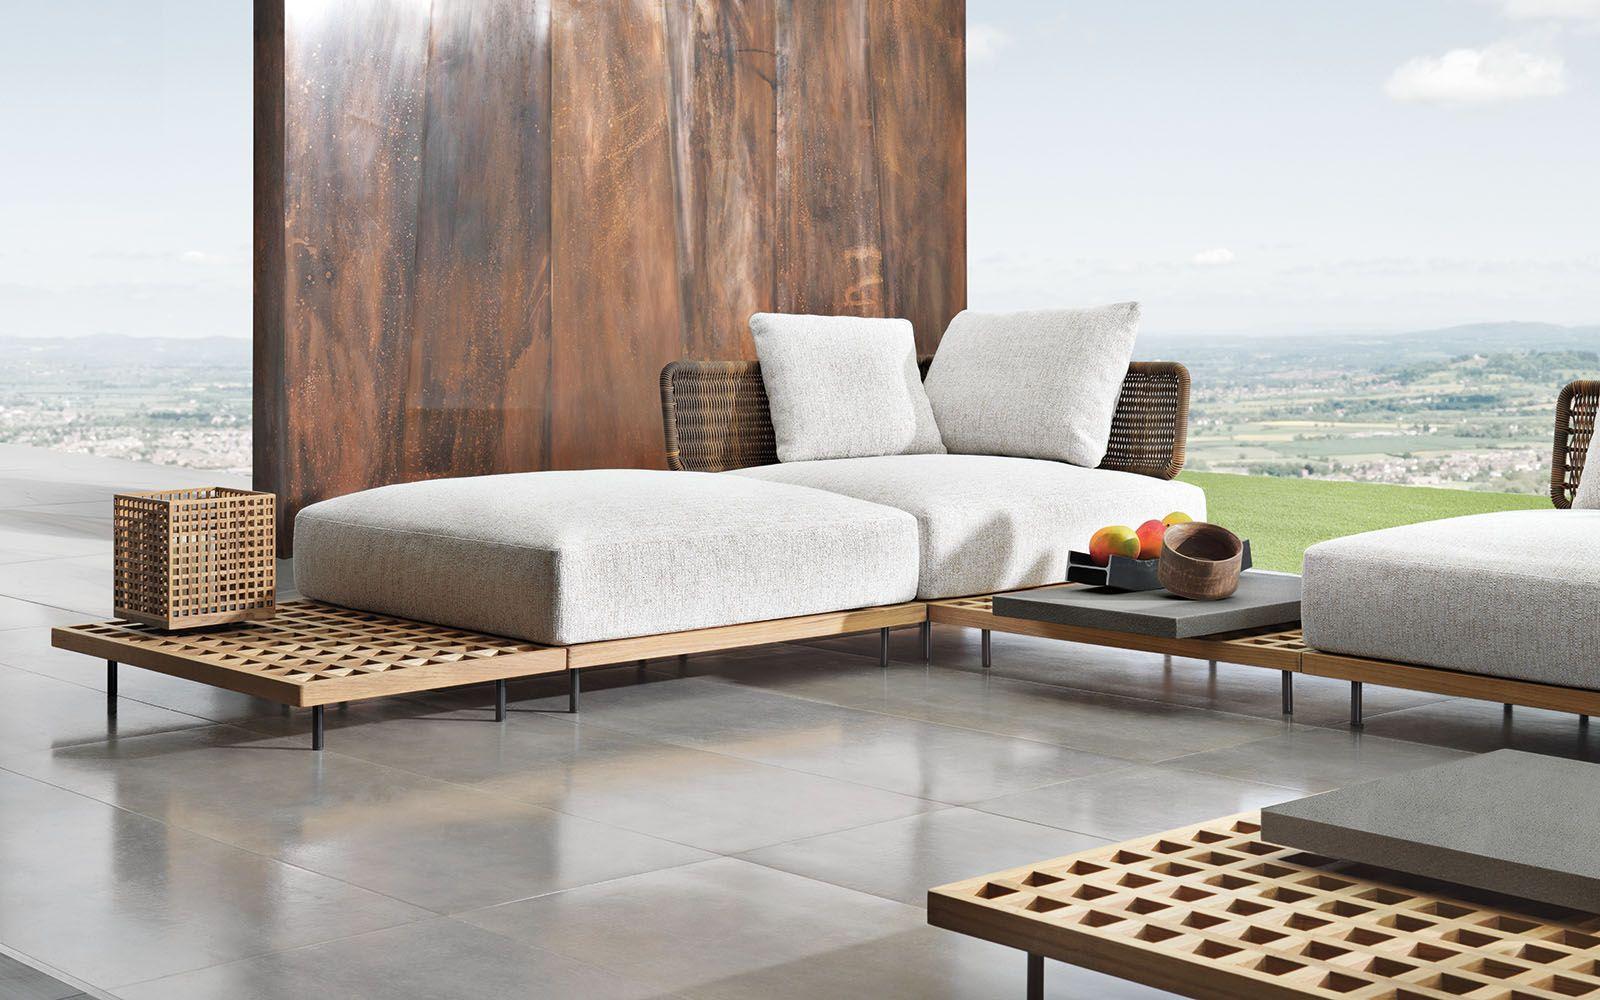 Quadrado outdoor marcio kogan studio mk27 design minotti70 2018collection seatingsystem outdoor marciokogan studiomk27